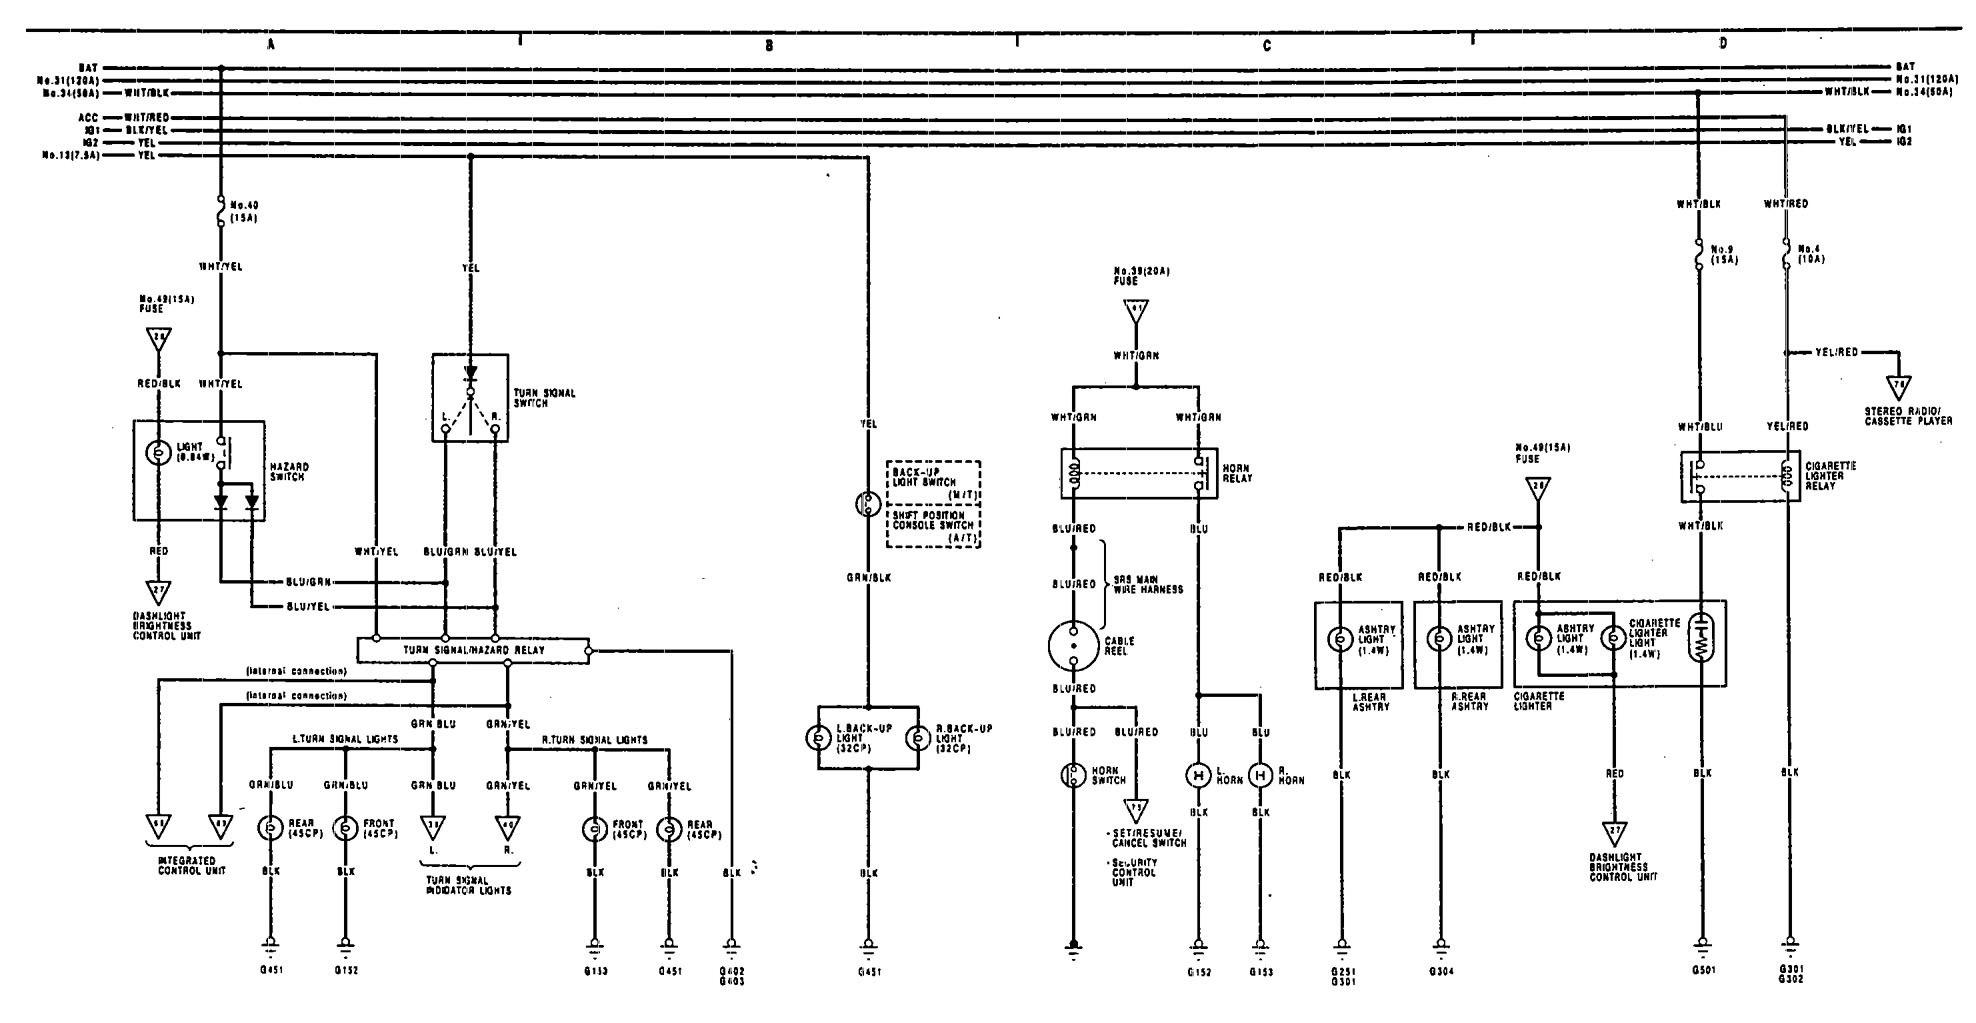 Acura Legend  1991 - 1992  - Wiring Diagram - Cigar Lighter